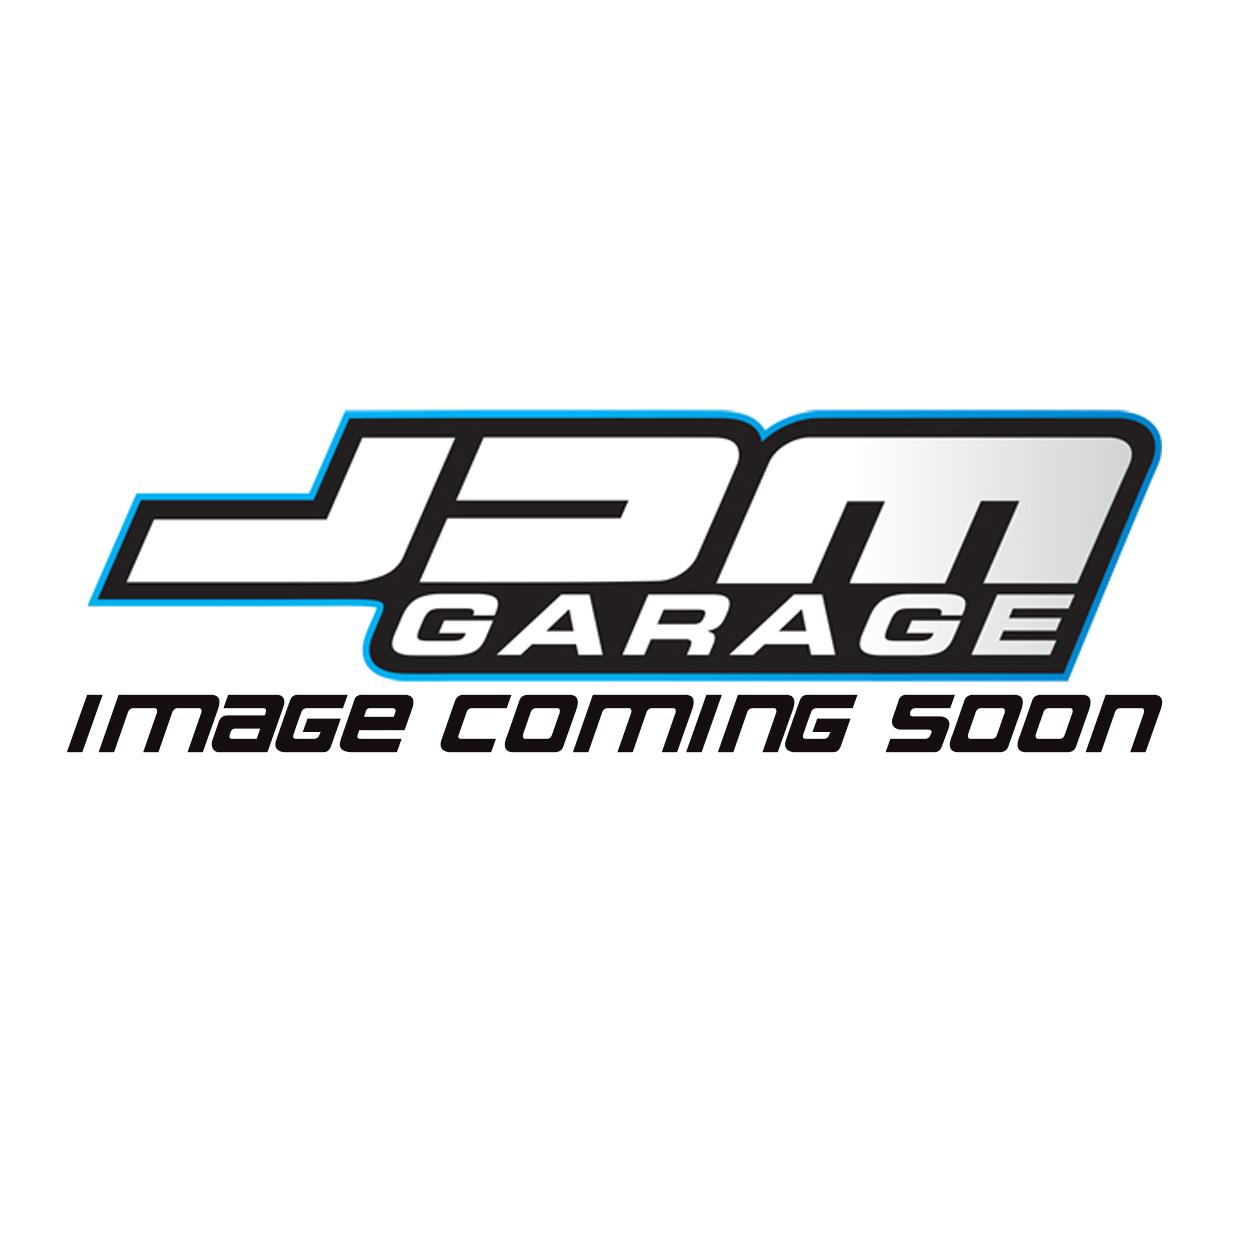 Genuine Nissan Rear Brake Pin Kit Fits Nissan Skyline R32 R33 GTST R34 GTT / Fairlady Z Z32